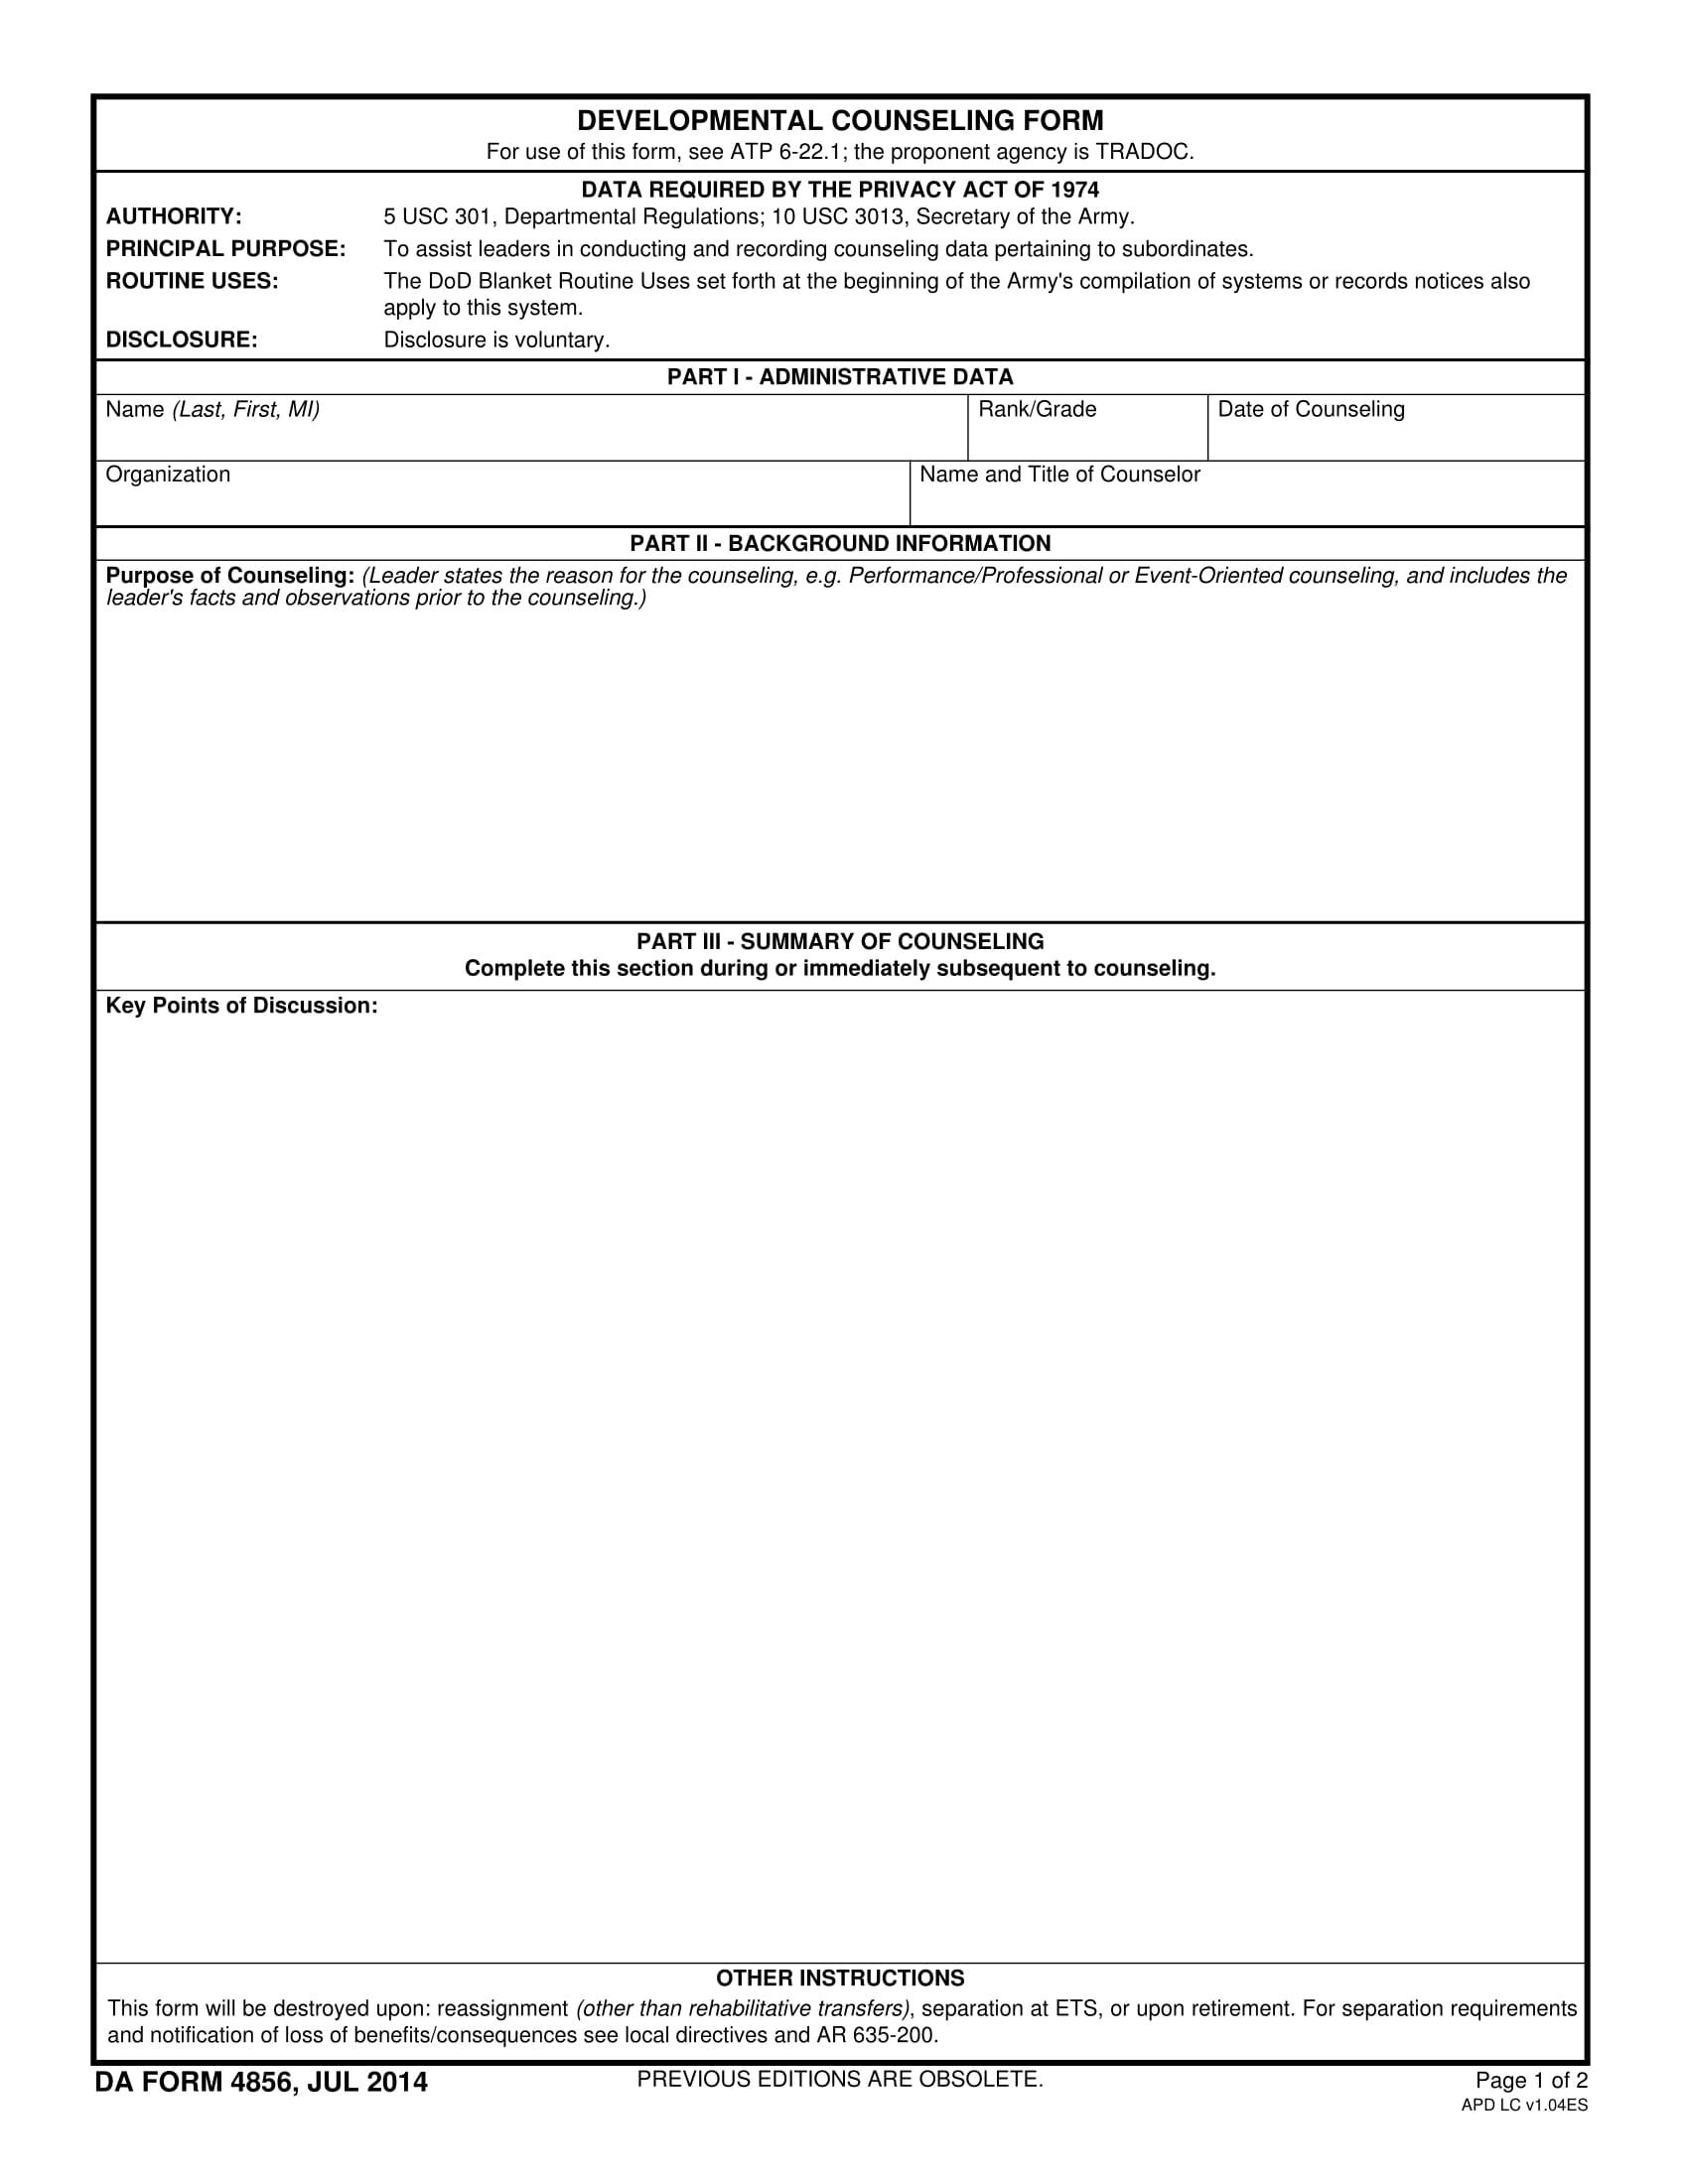 developmental counseling statement form 1